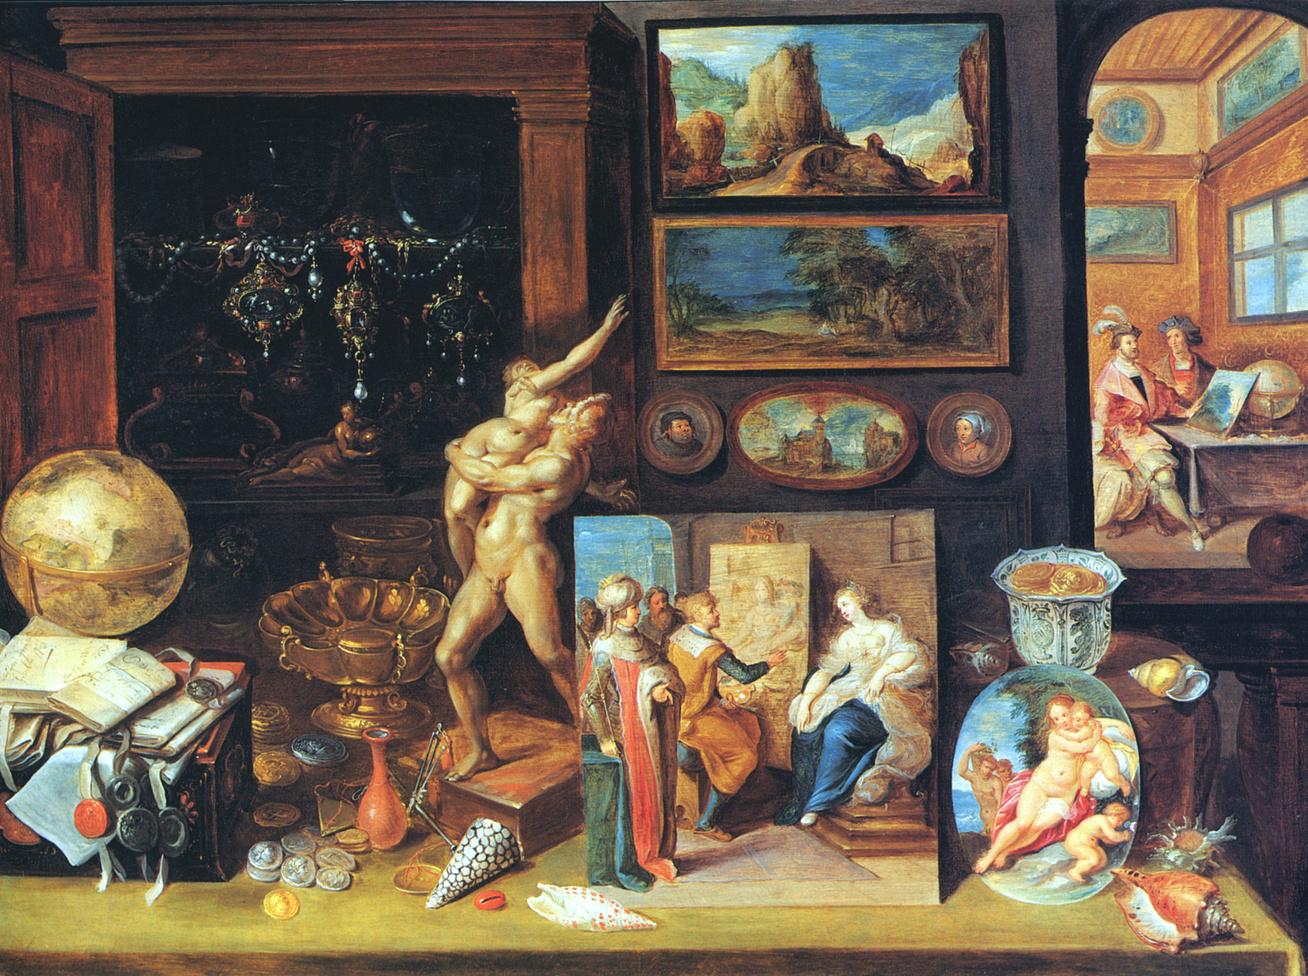 Frans Francken (II), A Collector's Cabinet (1625)